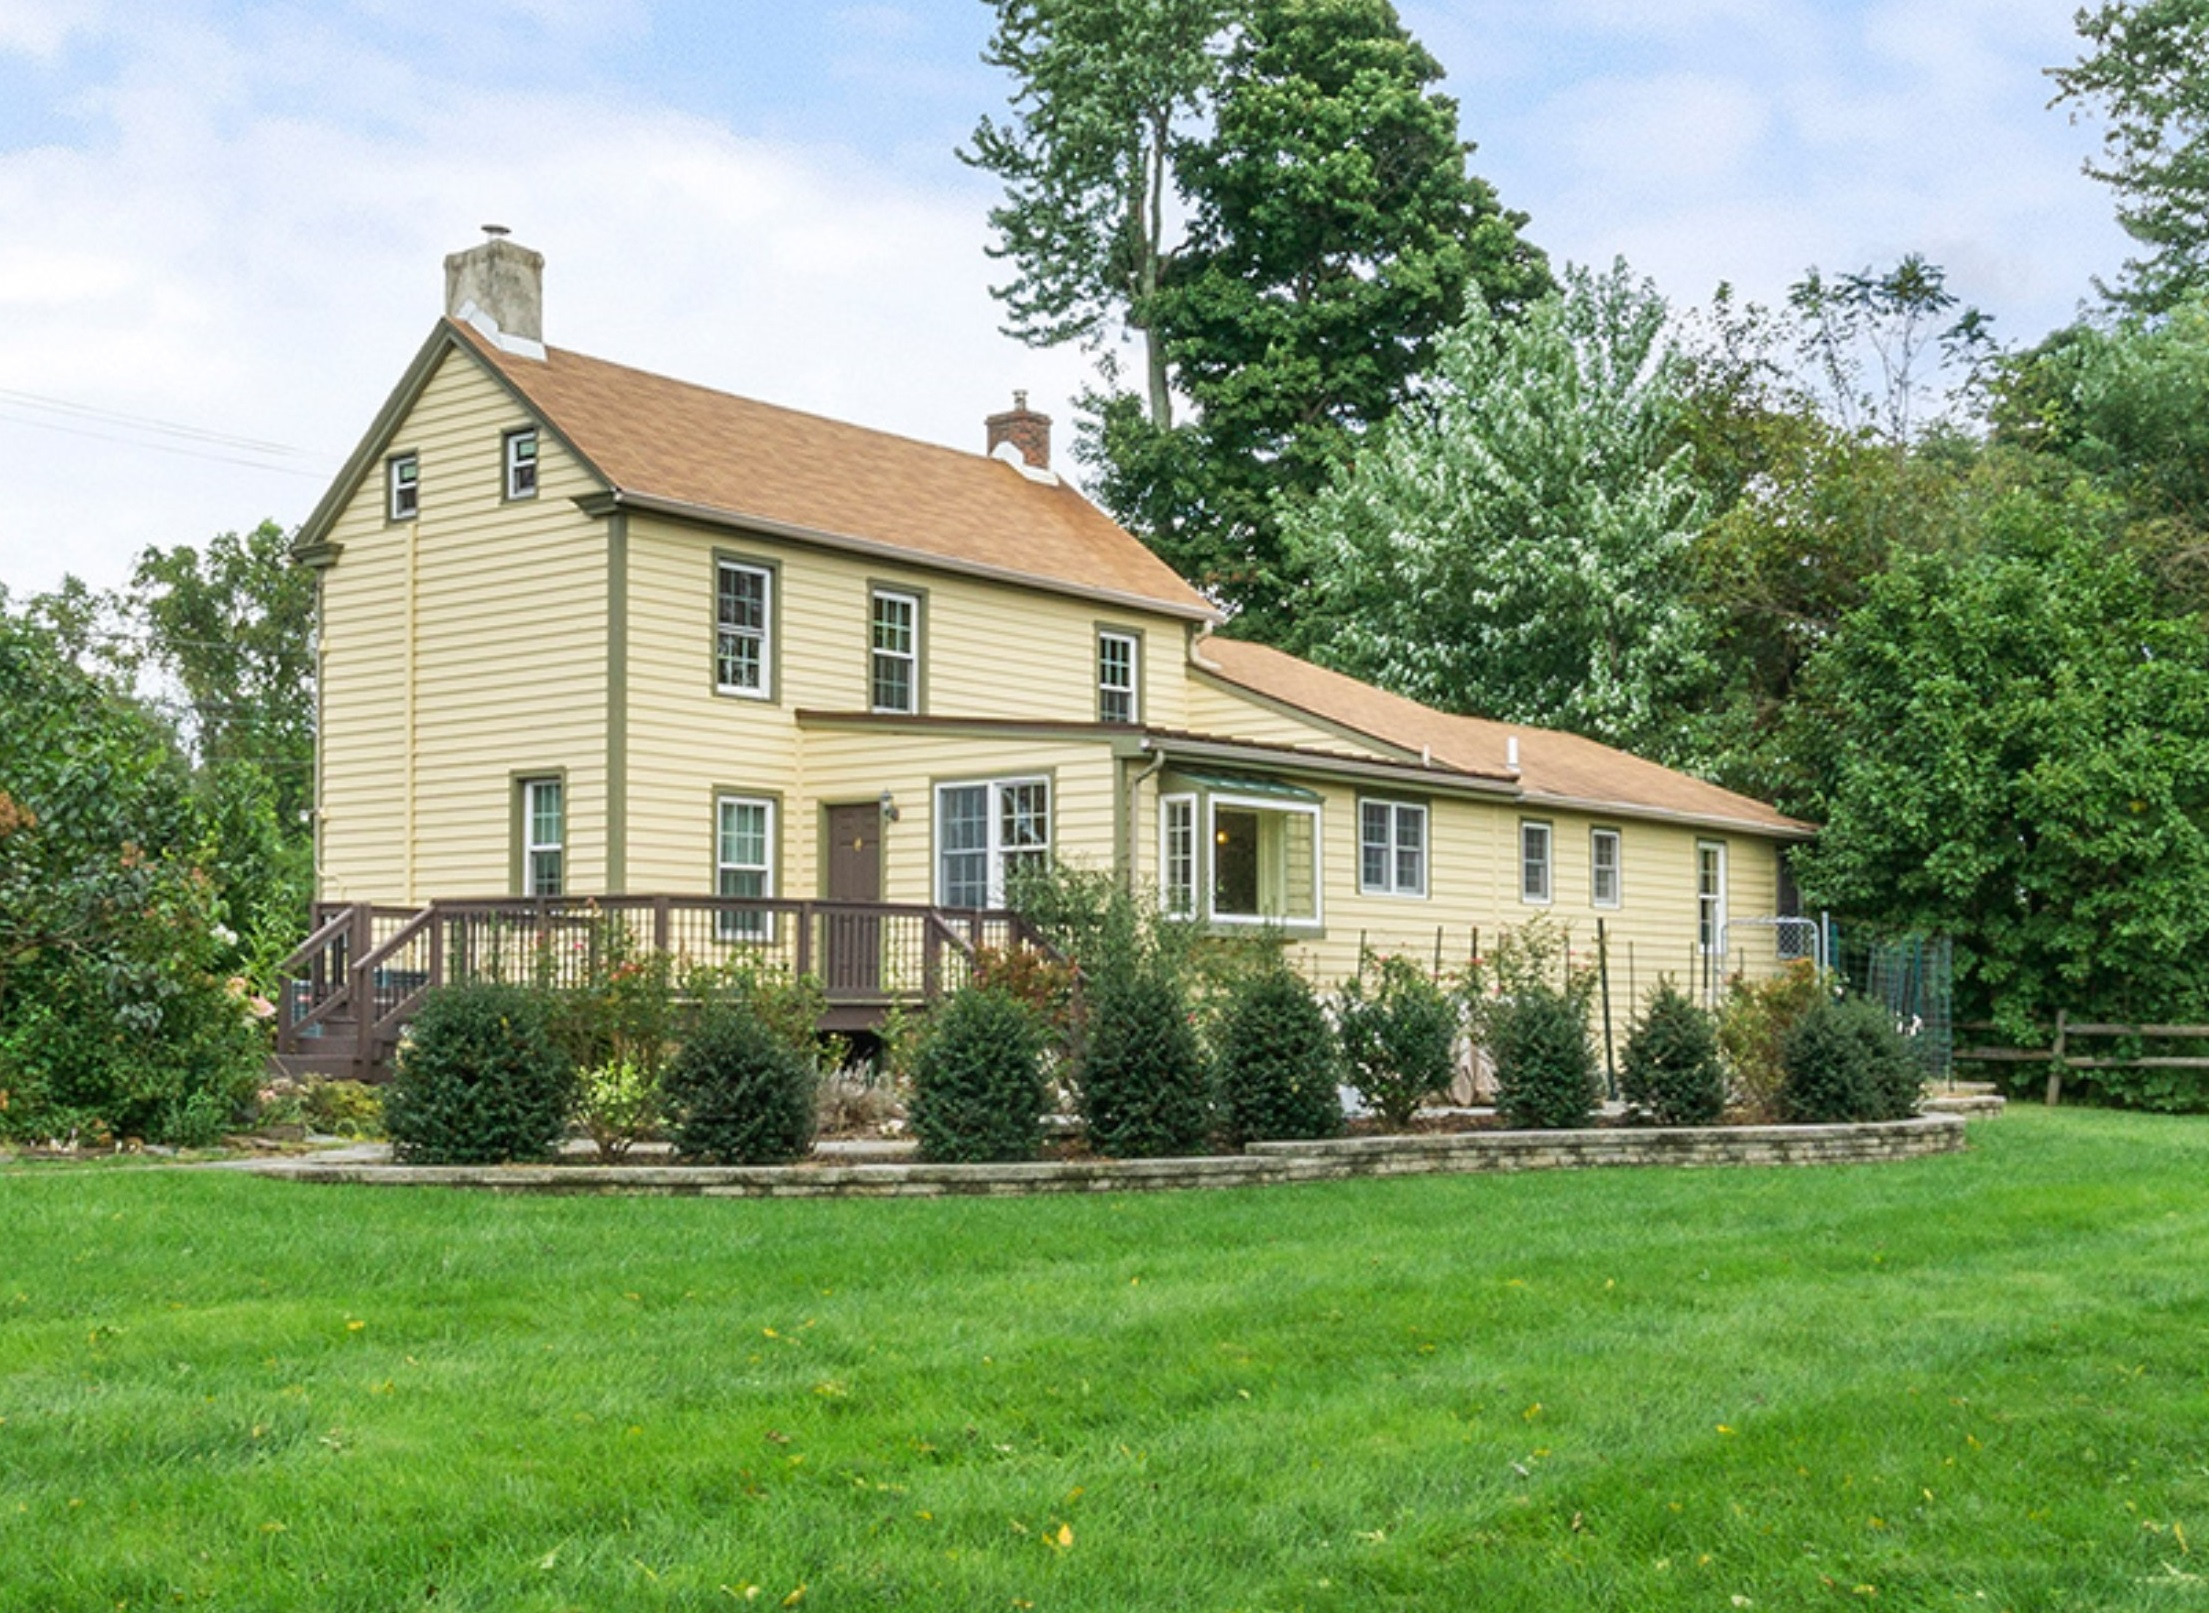 Historic Homes In Bucks | Steve Walny | New Hope Realtor